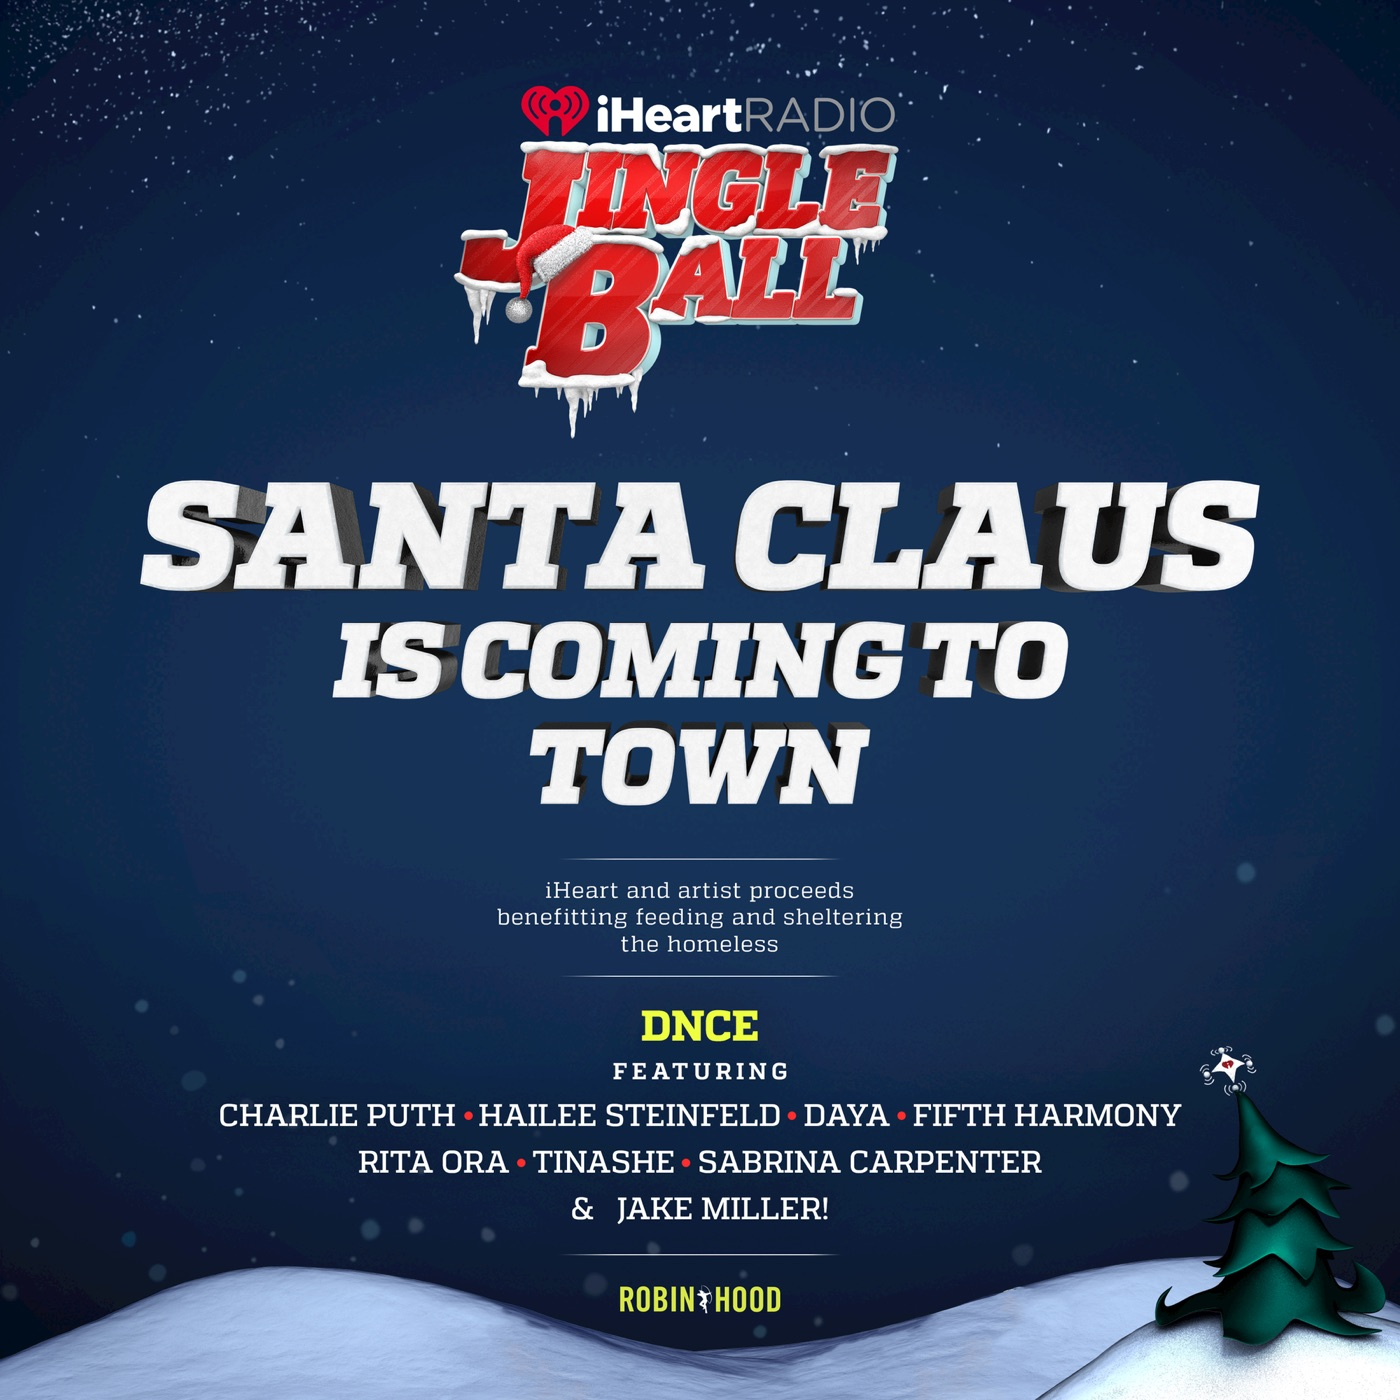 DNCE - Santa Claus Is Coming to Town (feat. Charlie Puth, Hailee Steinfeld, Daya, Fifth Harmony, Rita Ora, Tinashé, Sabrina Carpenter & Jake Miller) - Single